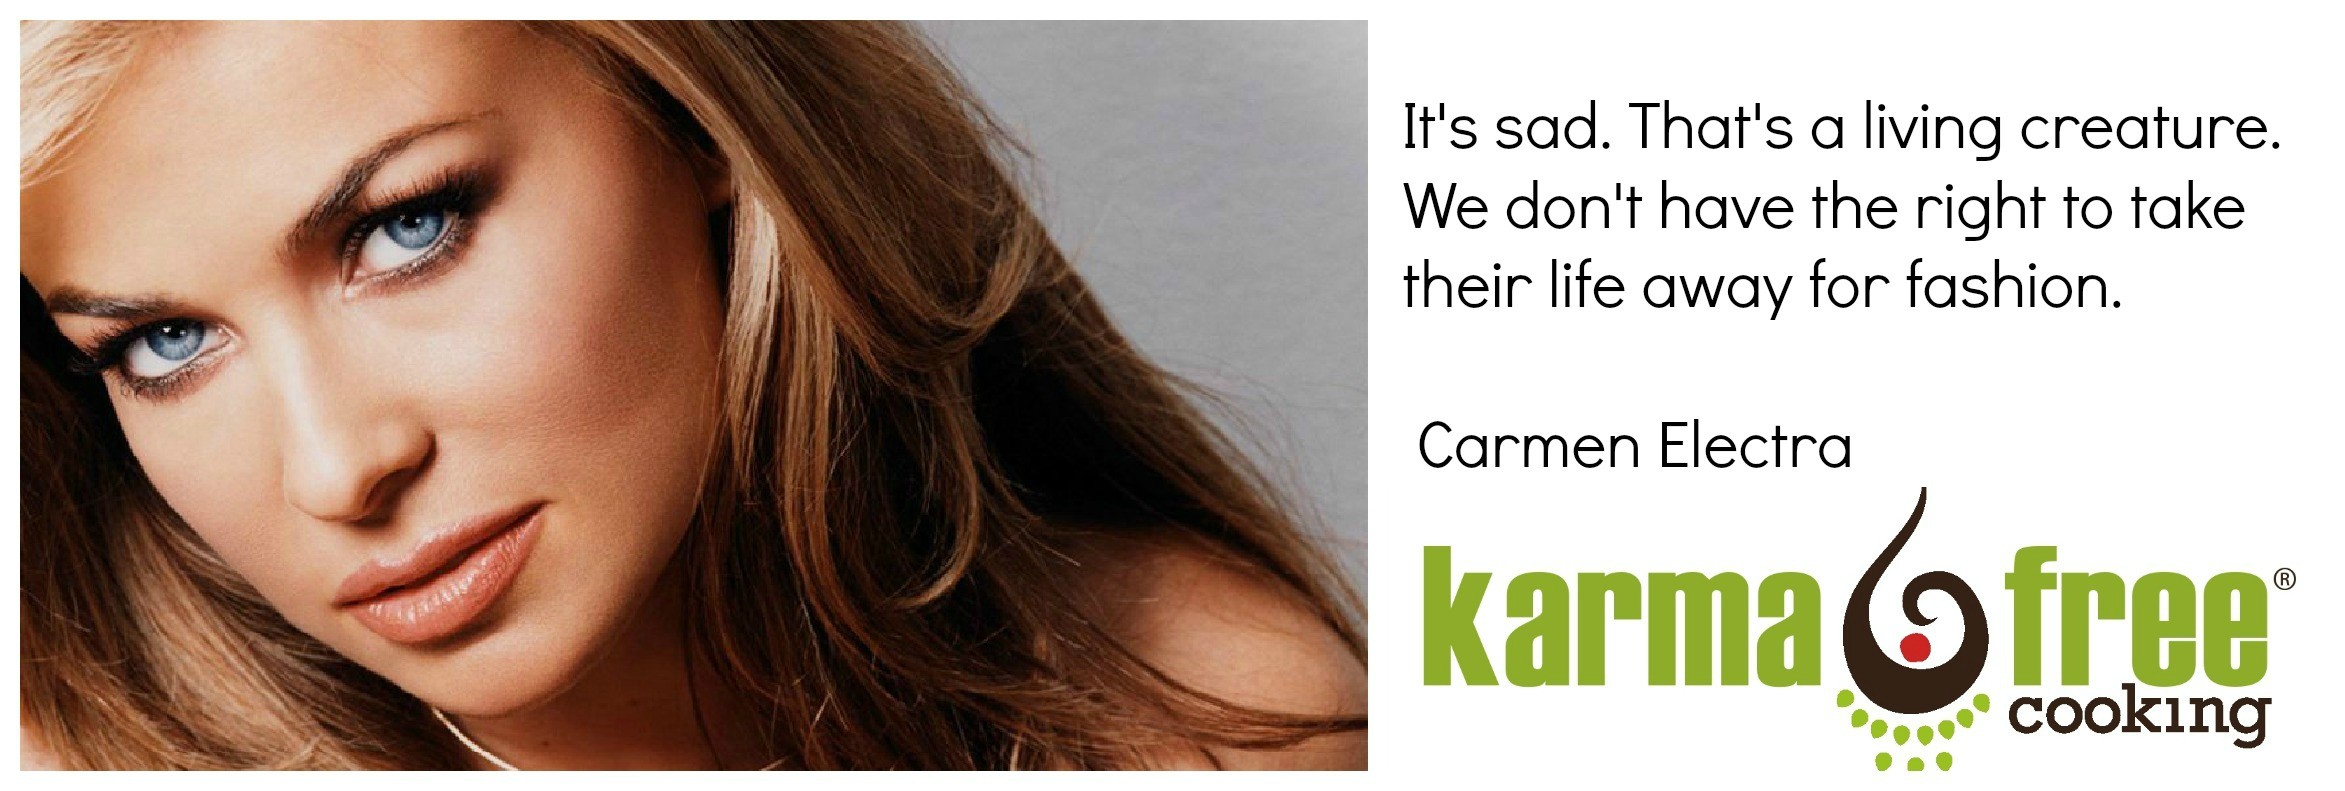 Carmen Electra's quote #1